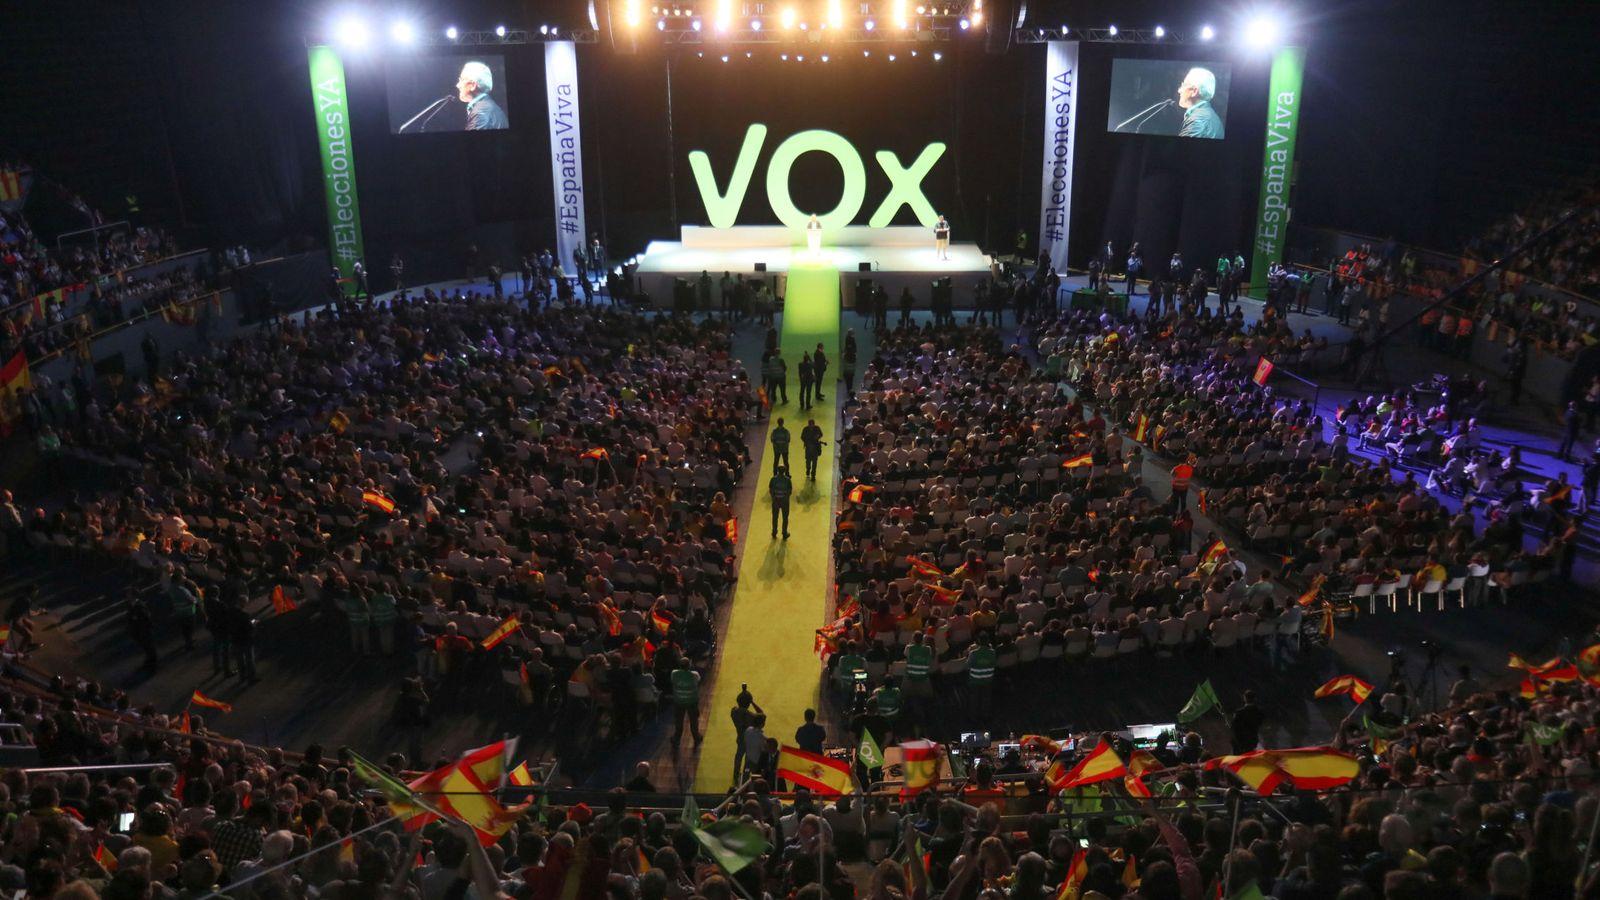 Foto: Acto público de Vox en Vistalegre el 7 de octubre de 2018. (Reuters)